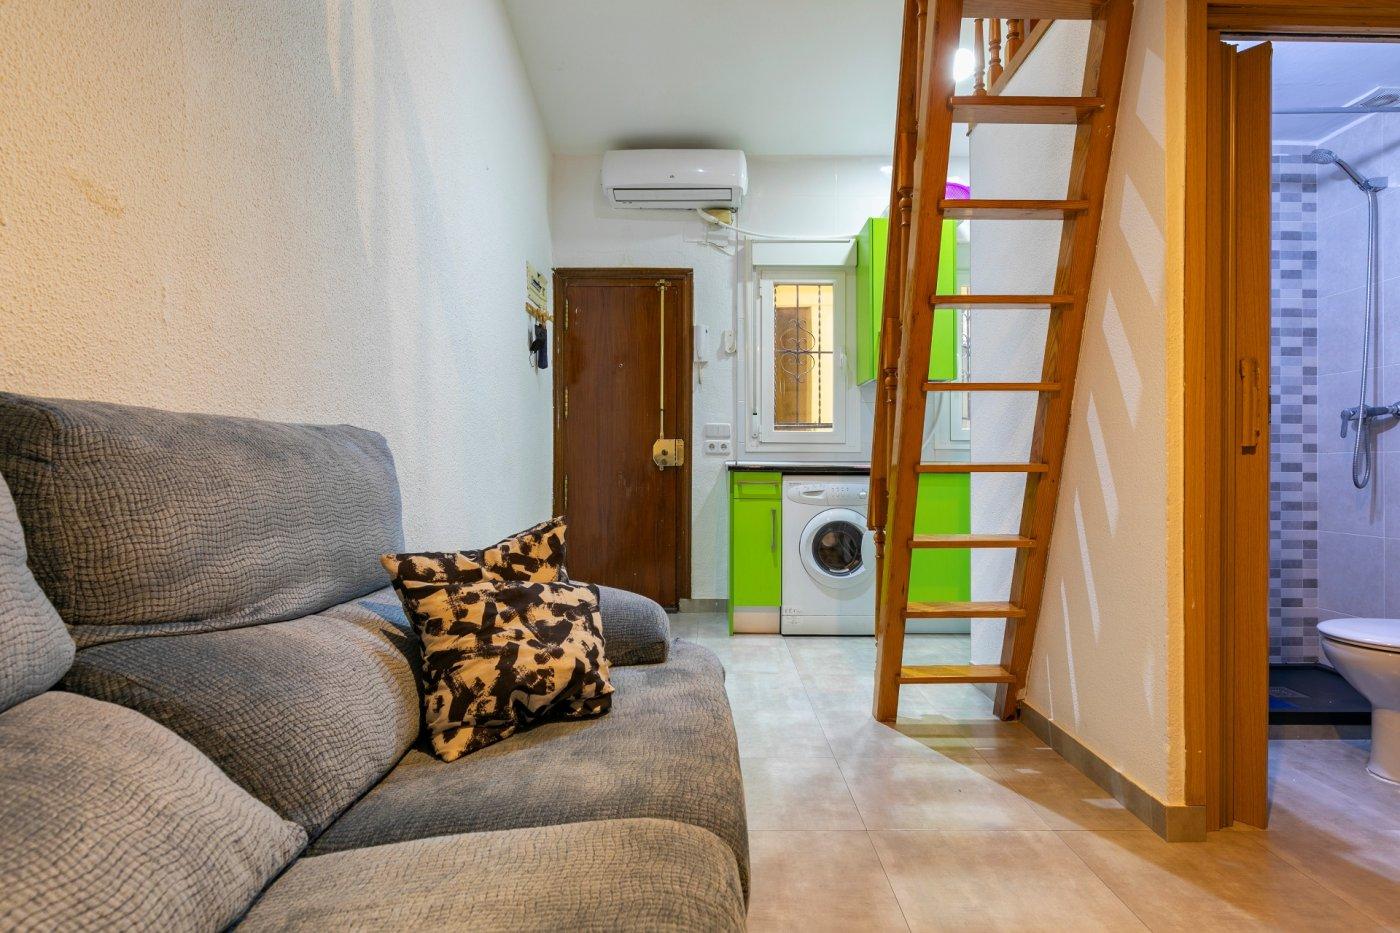 Apartamento, Chamberi, Venta - Madrid (Madrid)